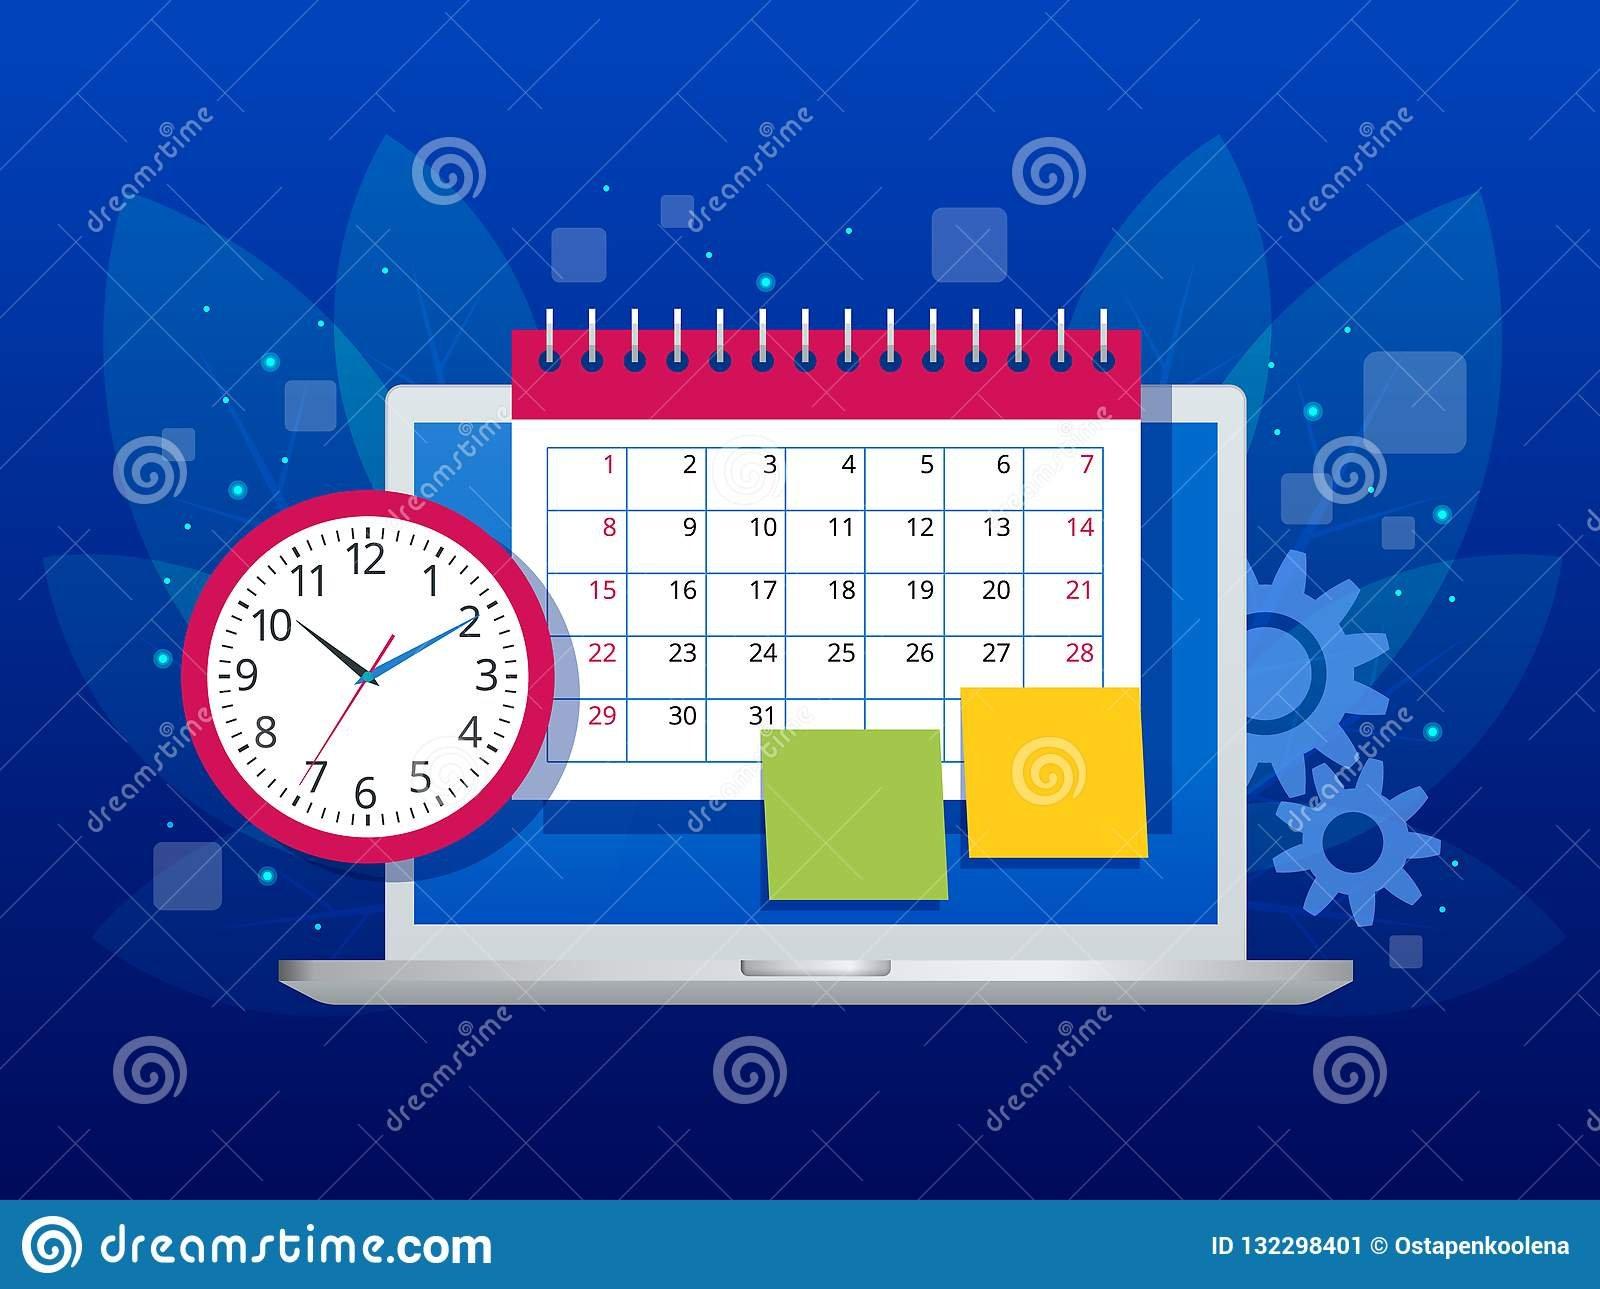 Flat Weekly Schedule And Calendar Planner Organization Free Downloadable Time Management Calendar